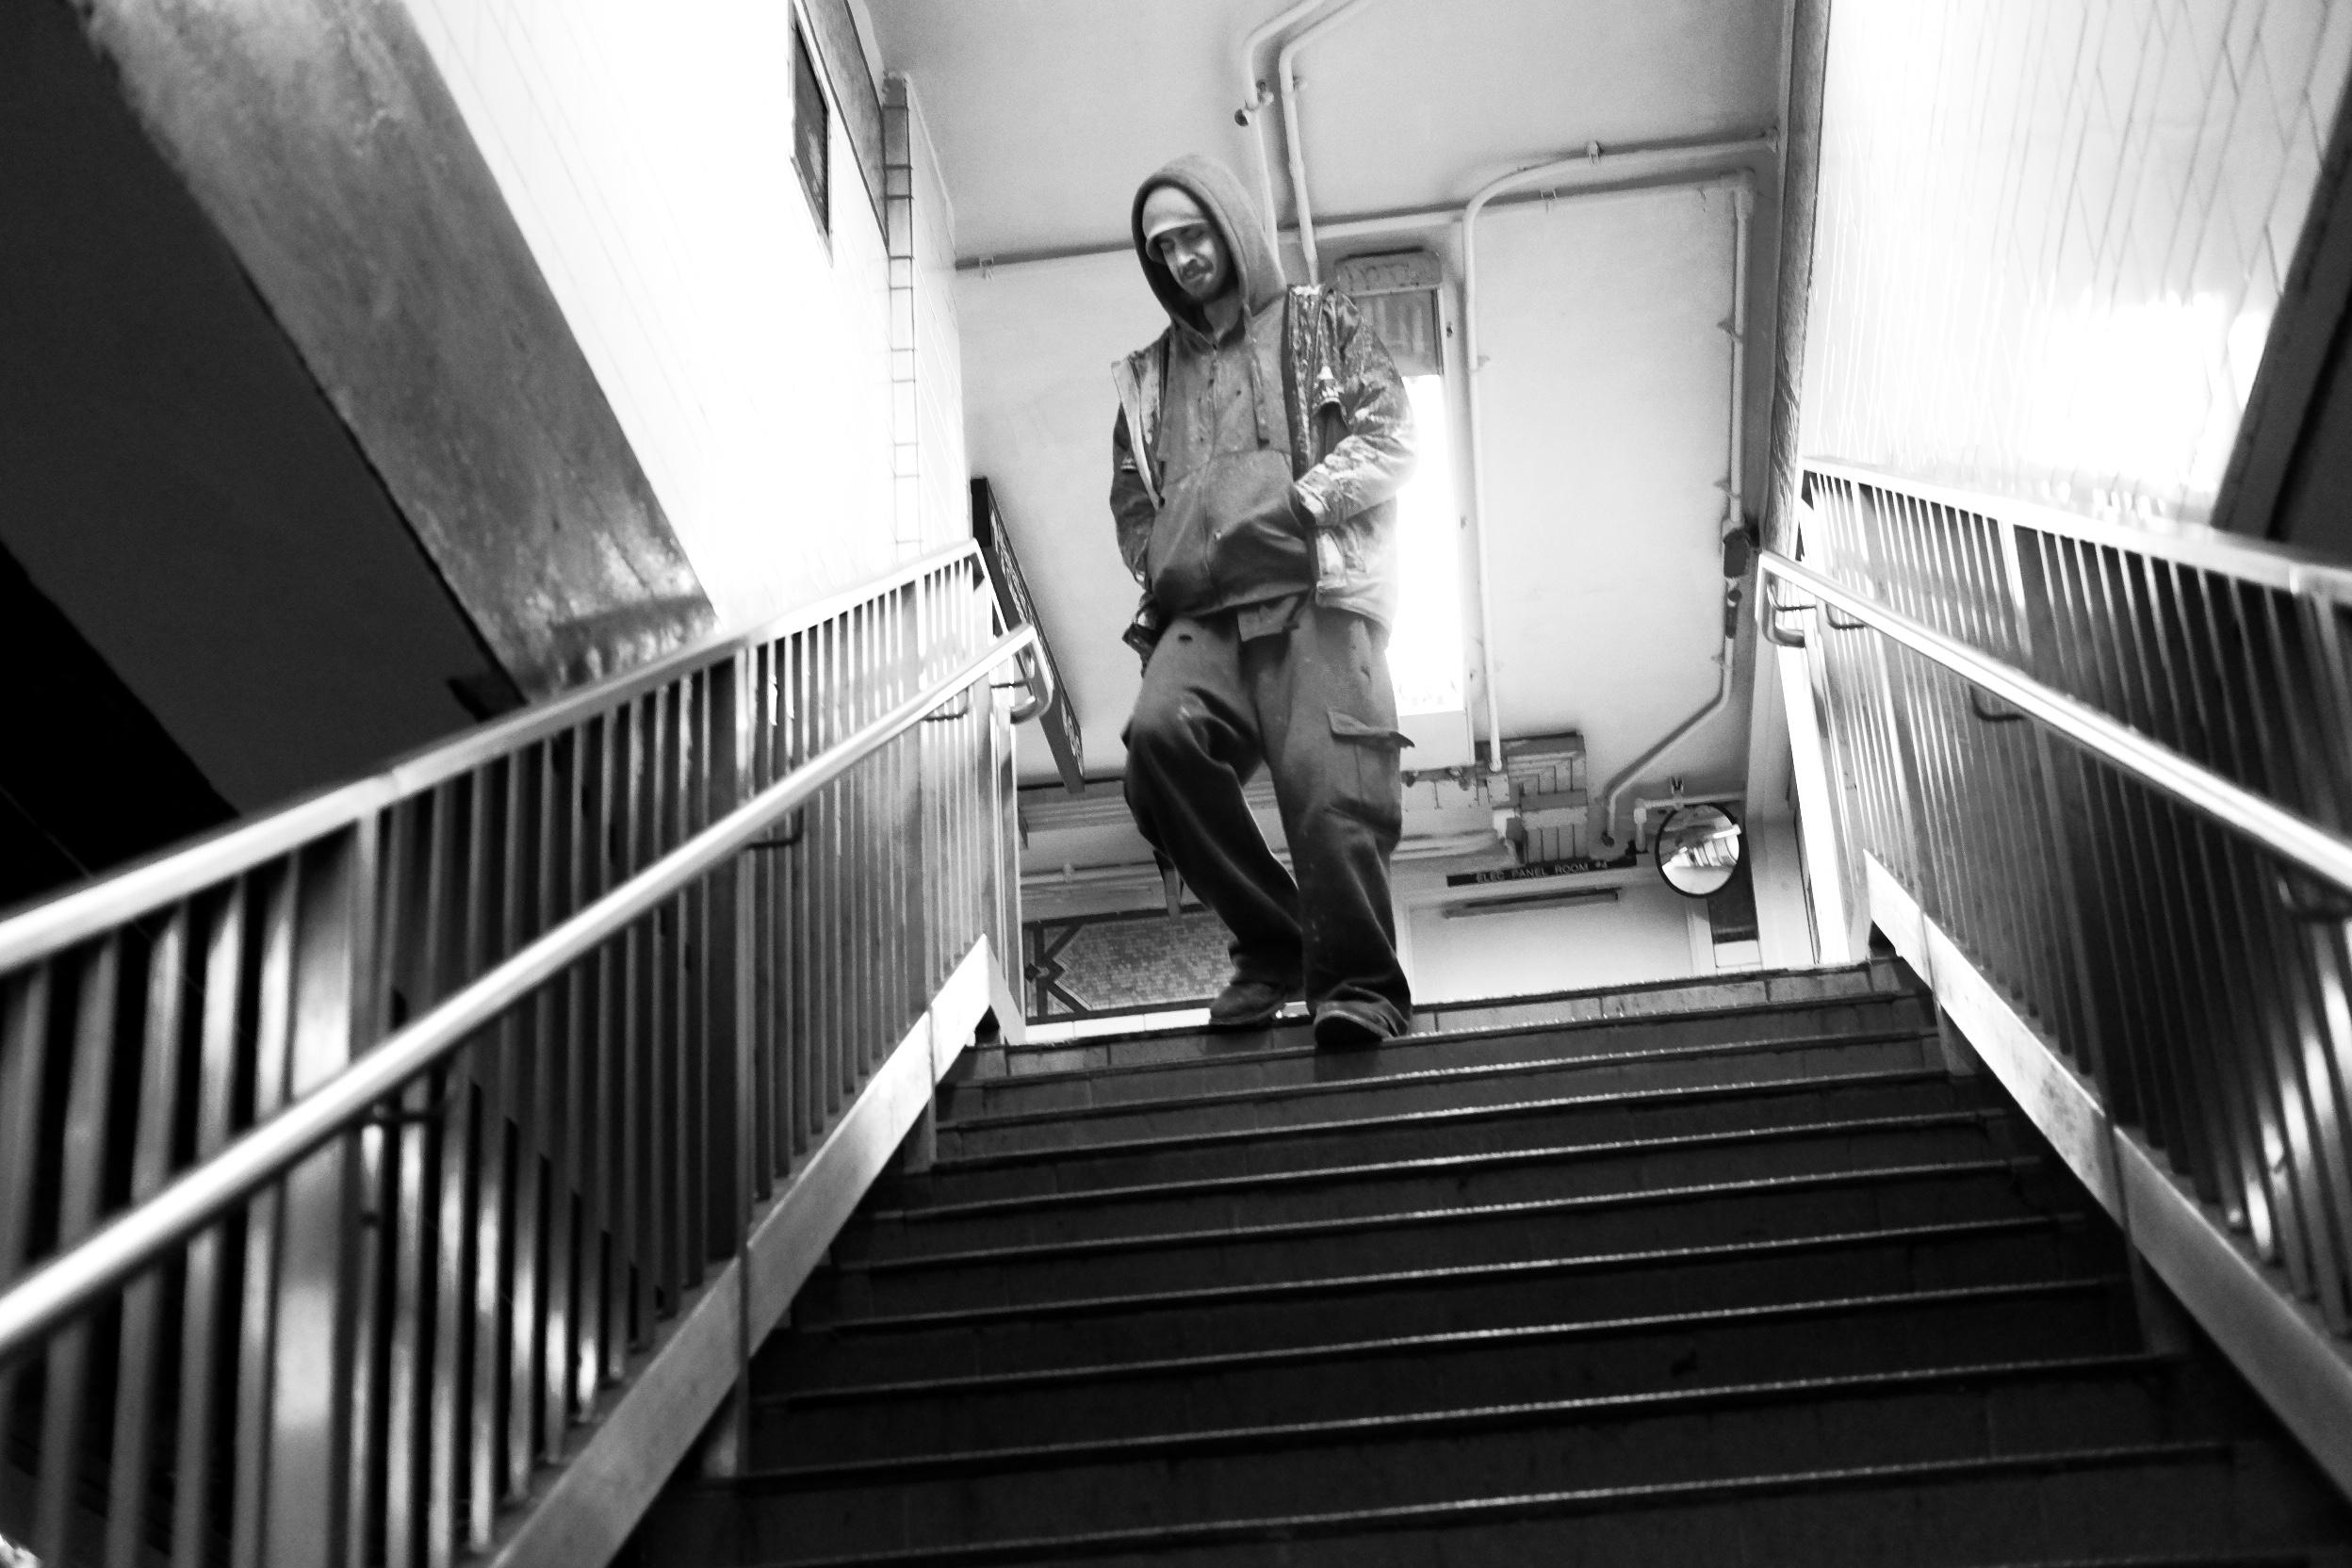 Man Walking Down Stairs.jpg